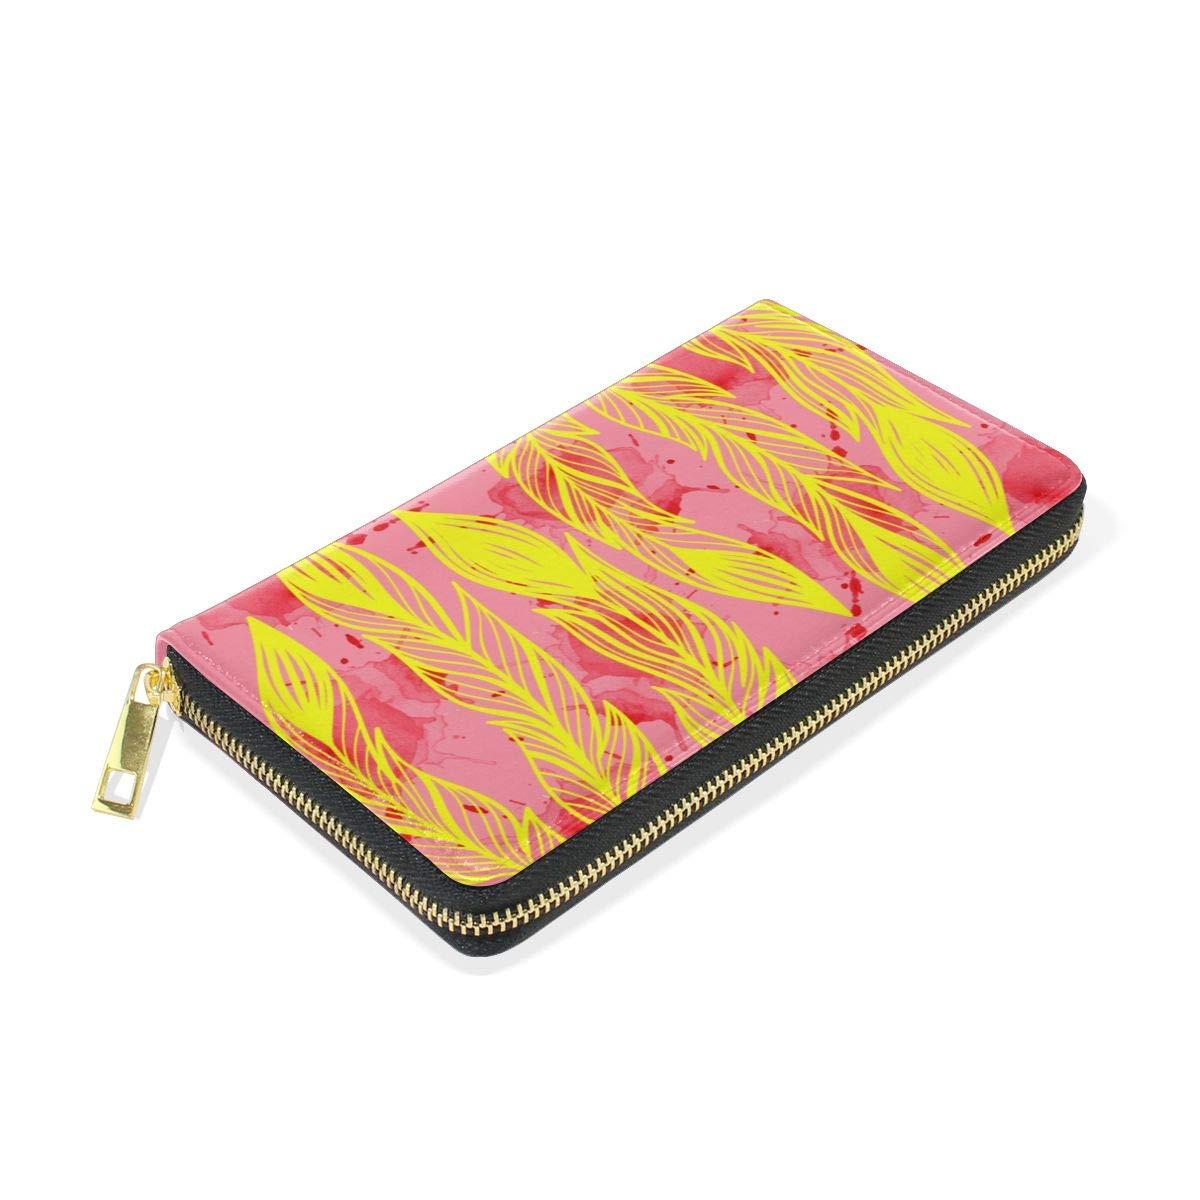 Caesar Melville Feather Arrow Coin Purse Canvas Bags Leather Long Wallet Handbag